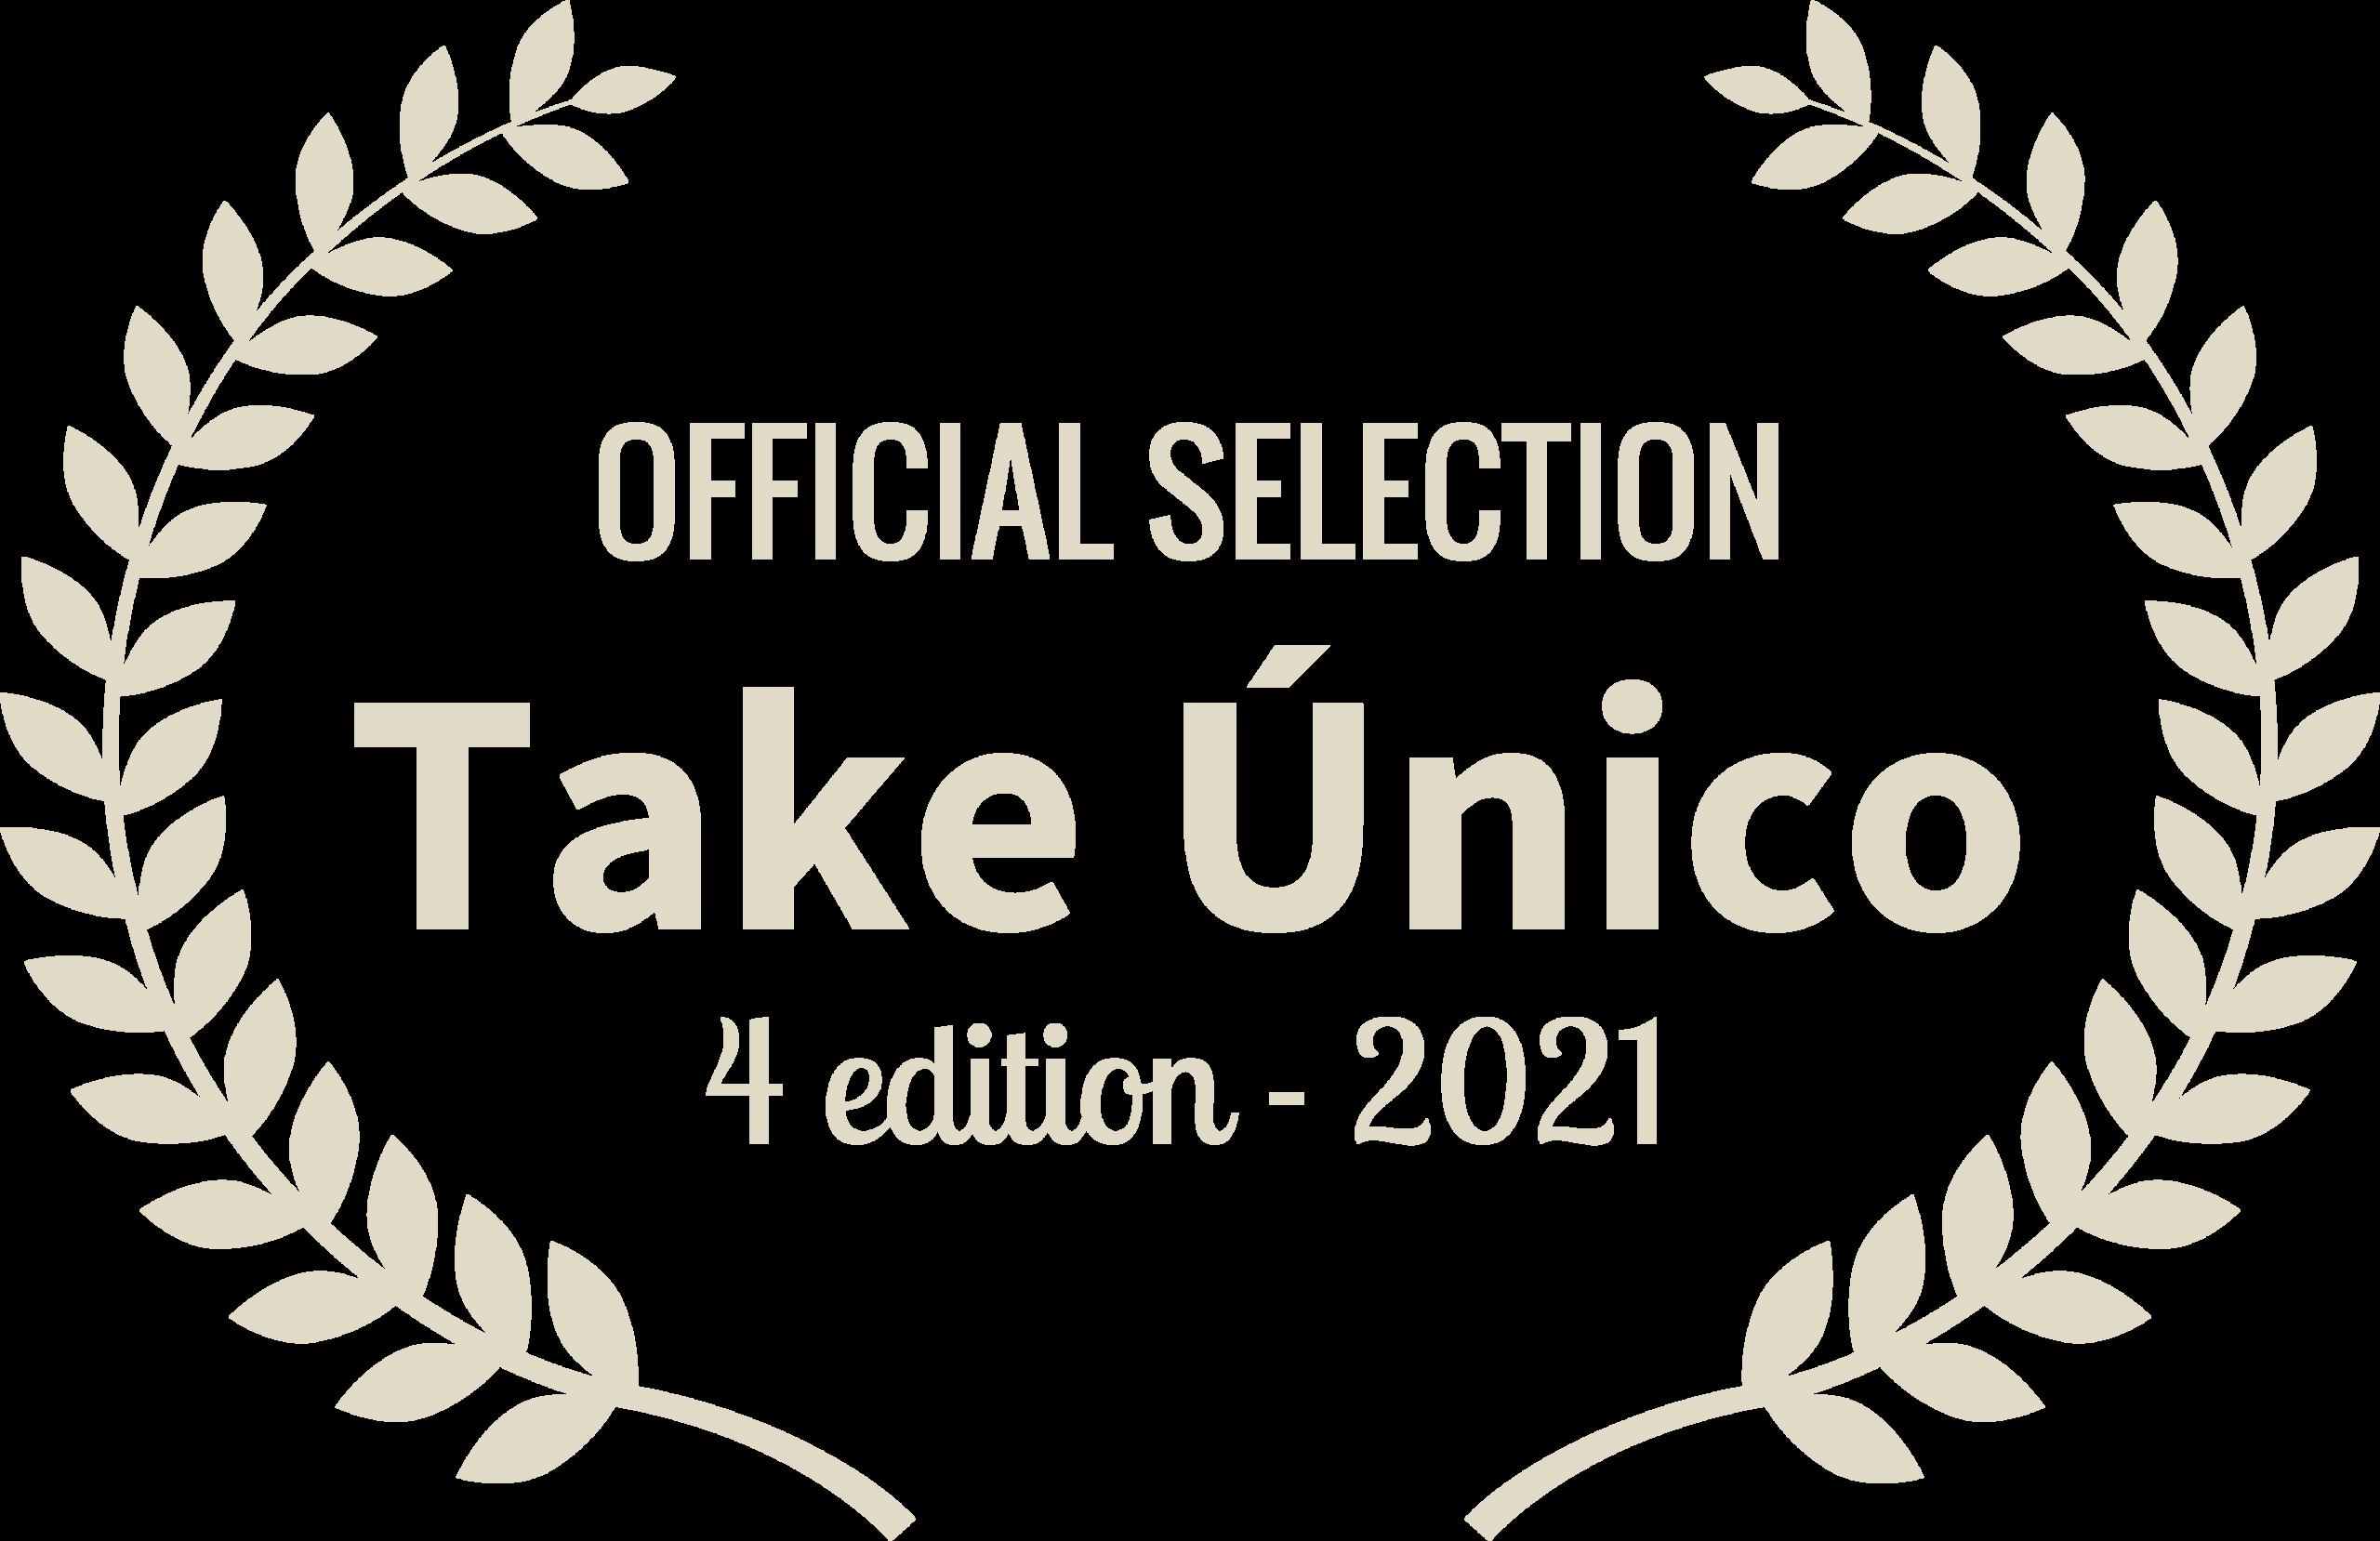 Take Unico